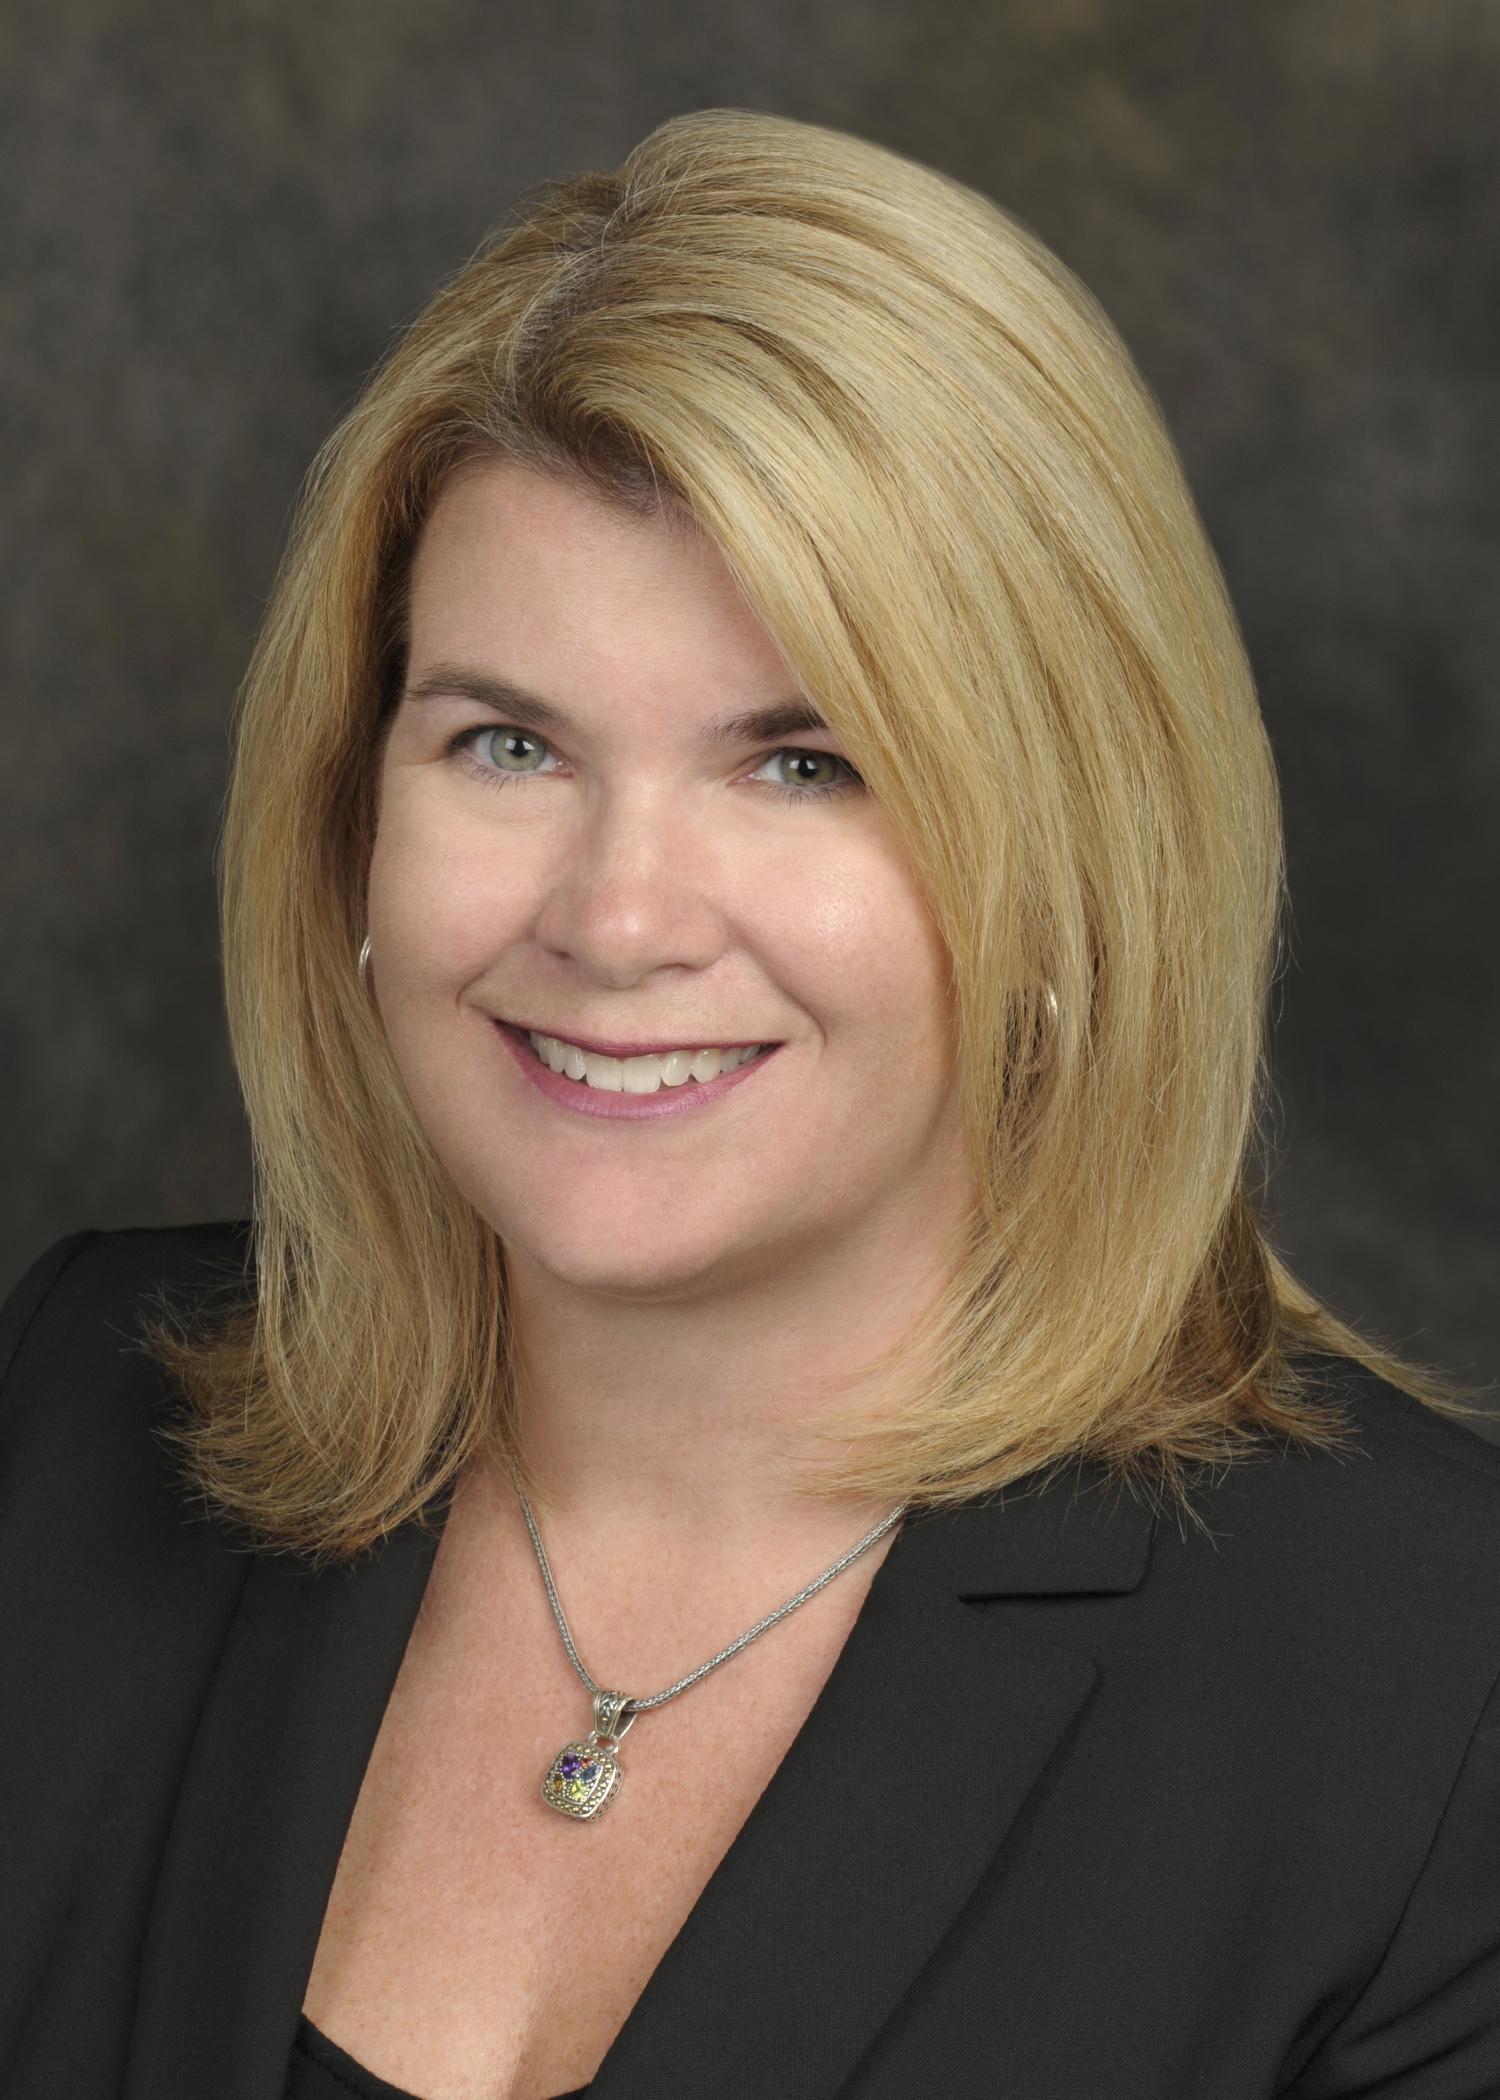 Jennifer Kent-Walsh's profile picture at UCF